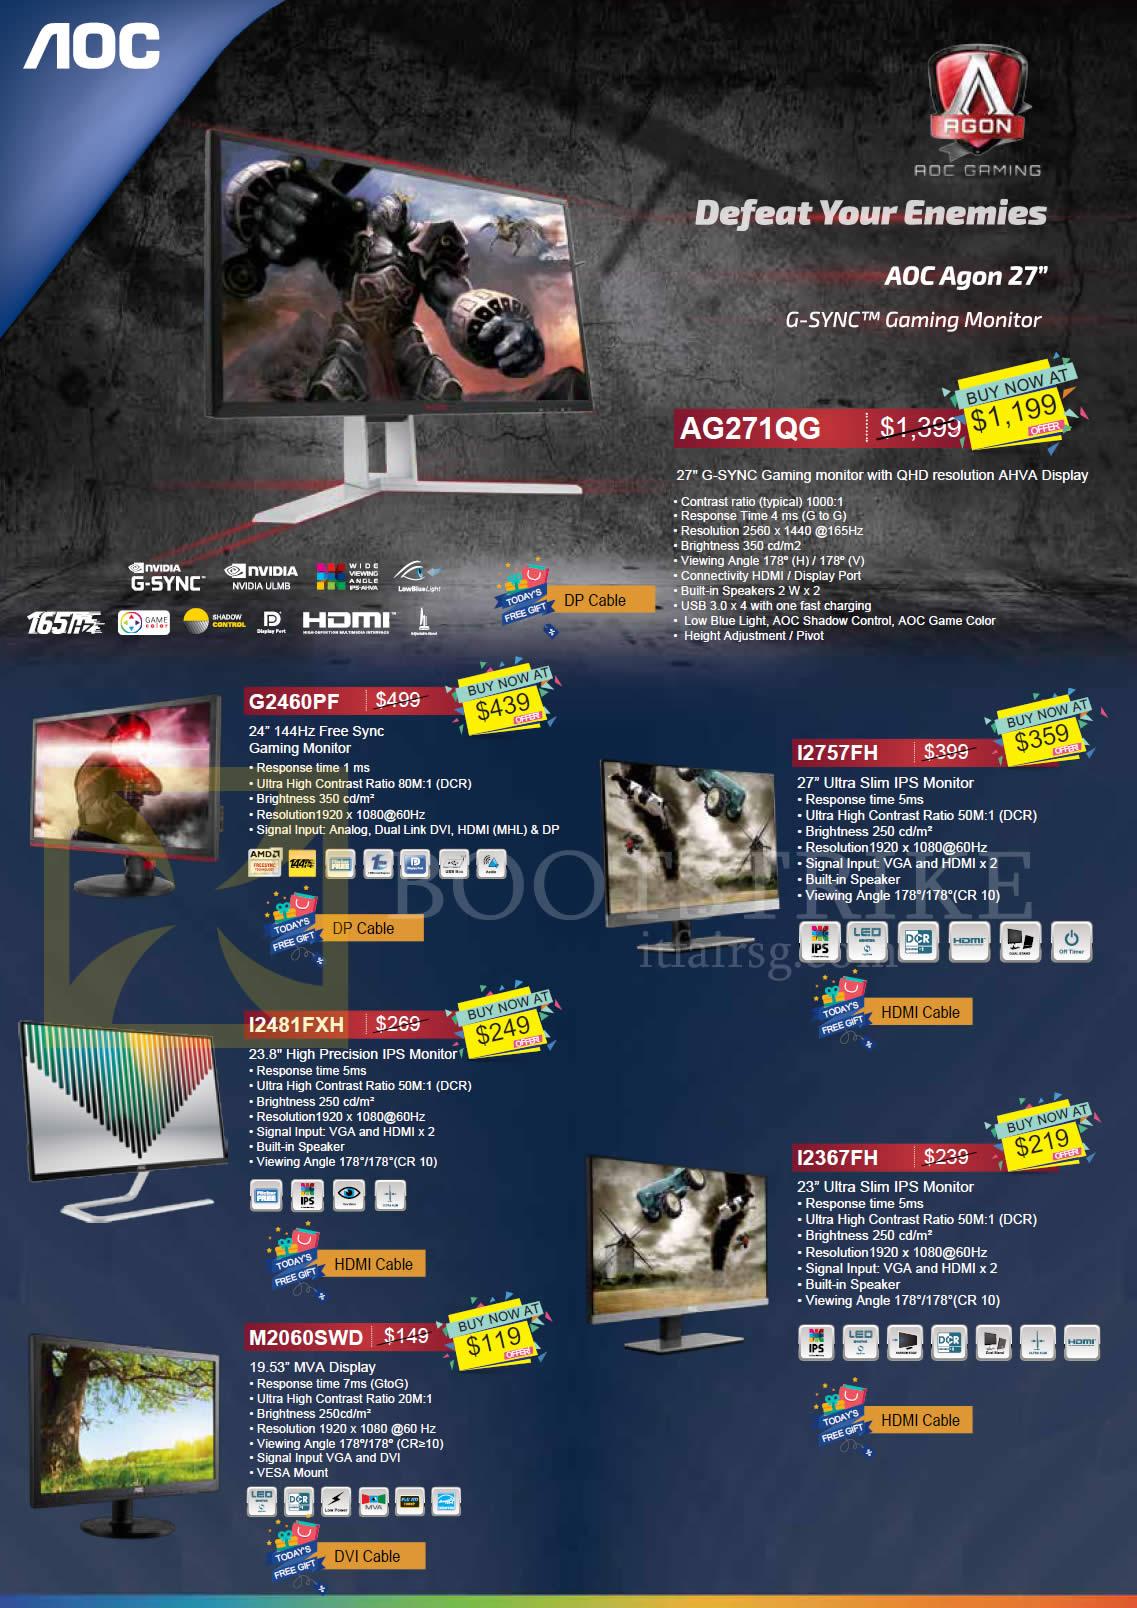 COMEX 2016 price list image brochure of Newstead AOC Monitors IPS Free Sync G-Sync AG271QG, G2460PF, I2757FH, I2481FXH, I257FH, I2367FH, M2060SWD